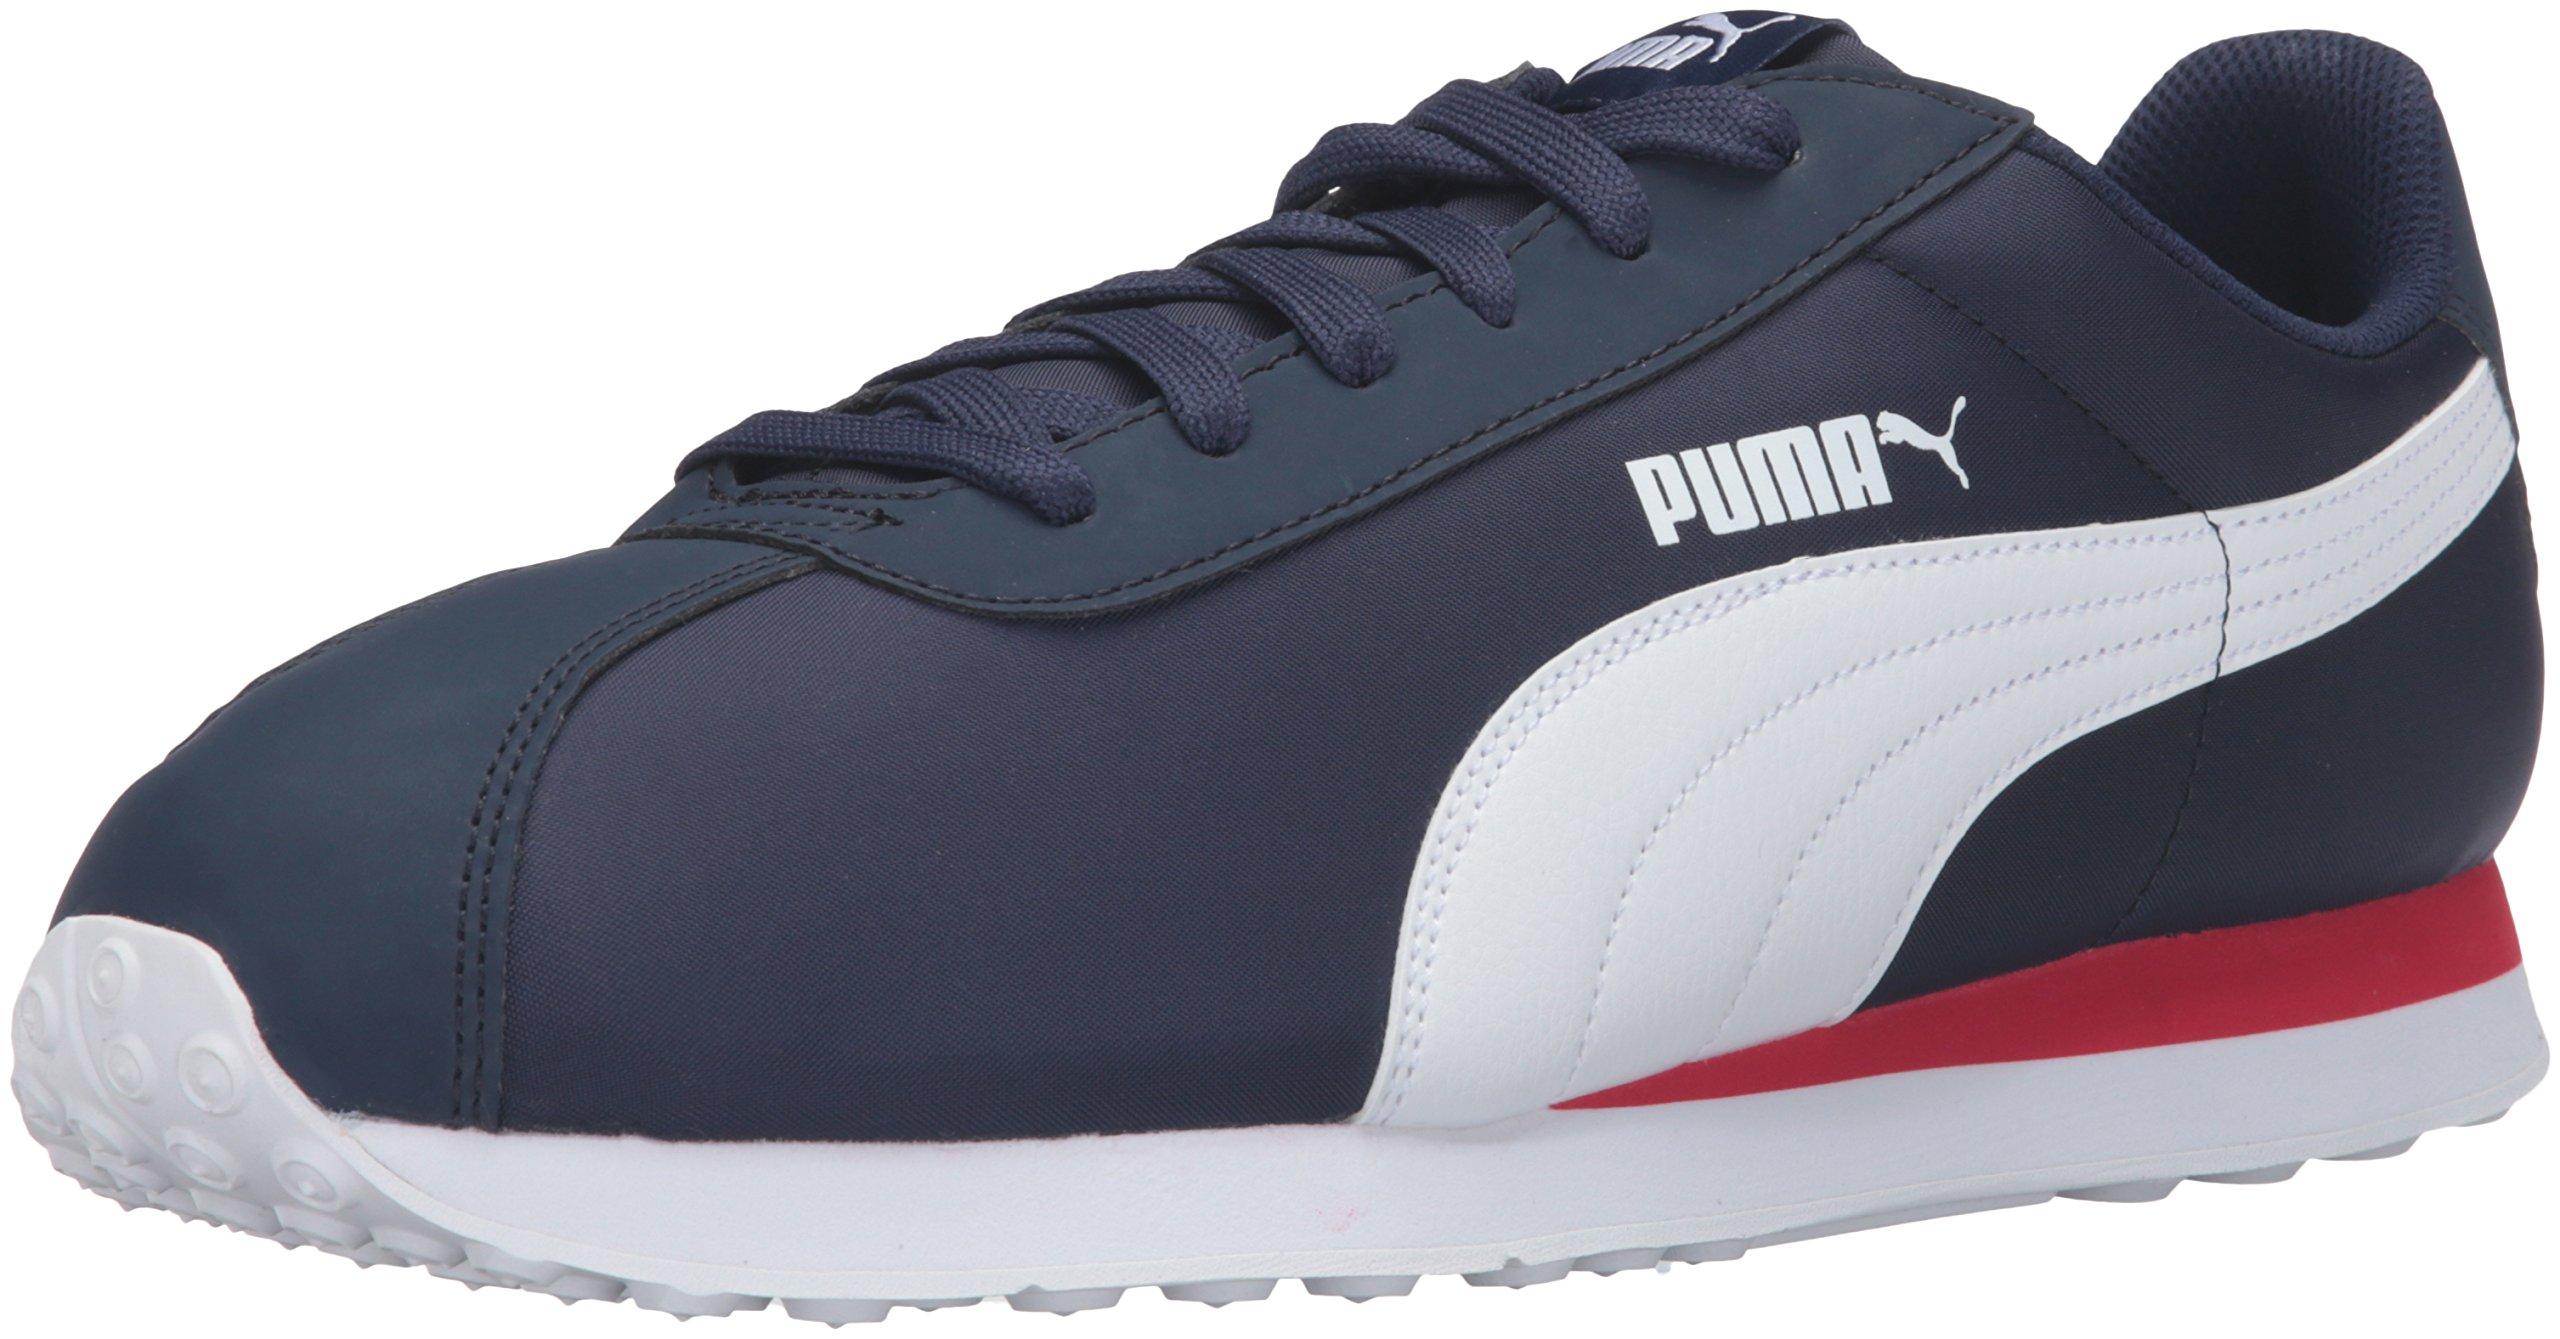 PUMA Men's Turin NL Fashion Sneaker, Peacoat White, 11.5 M US